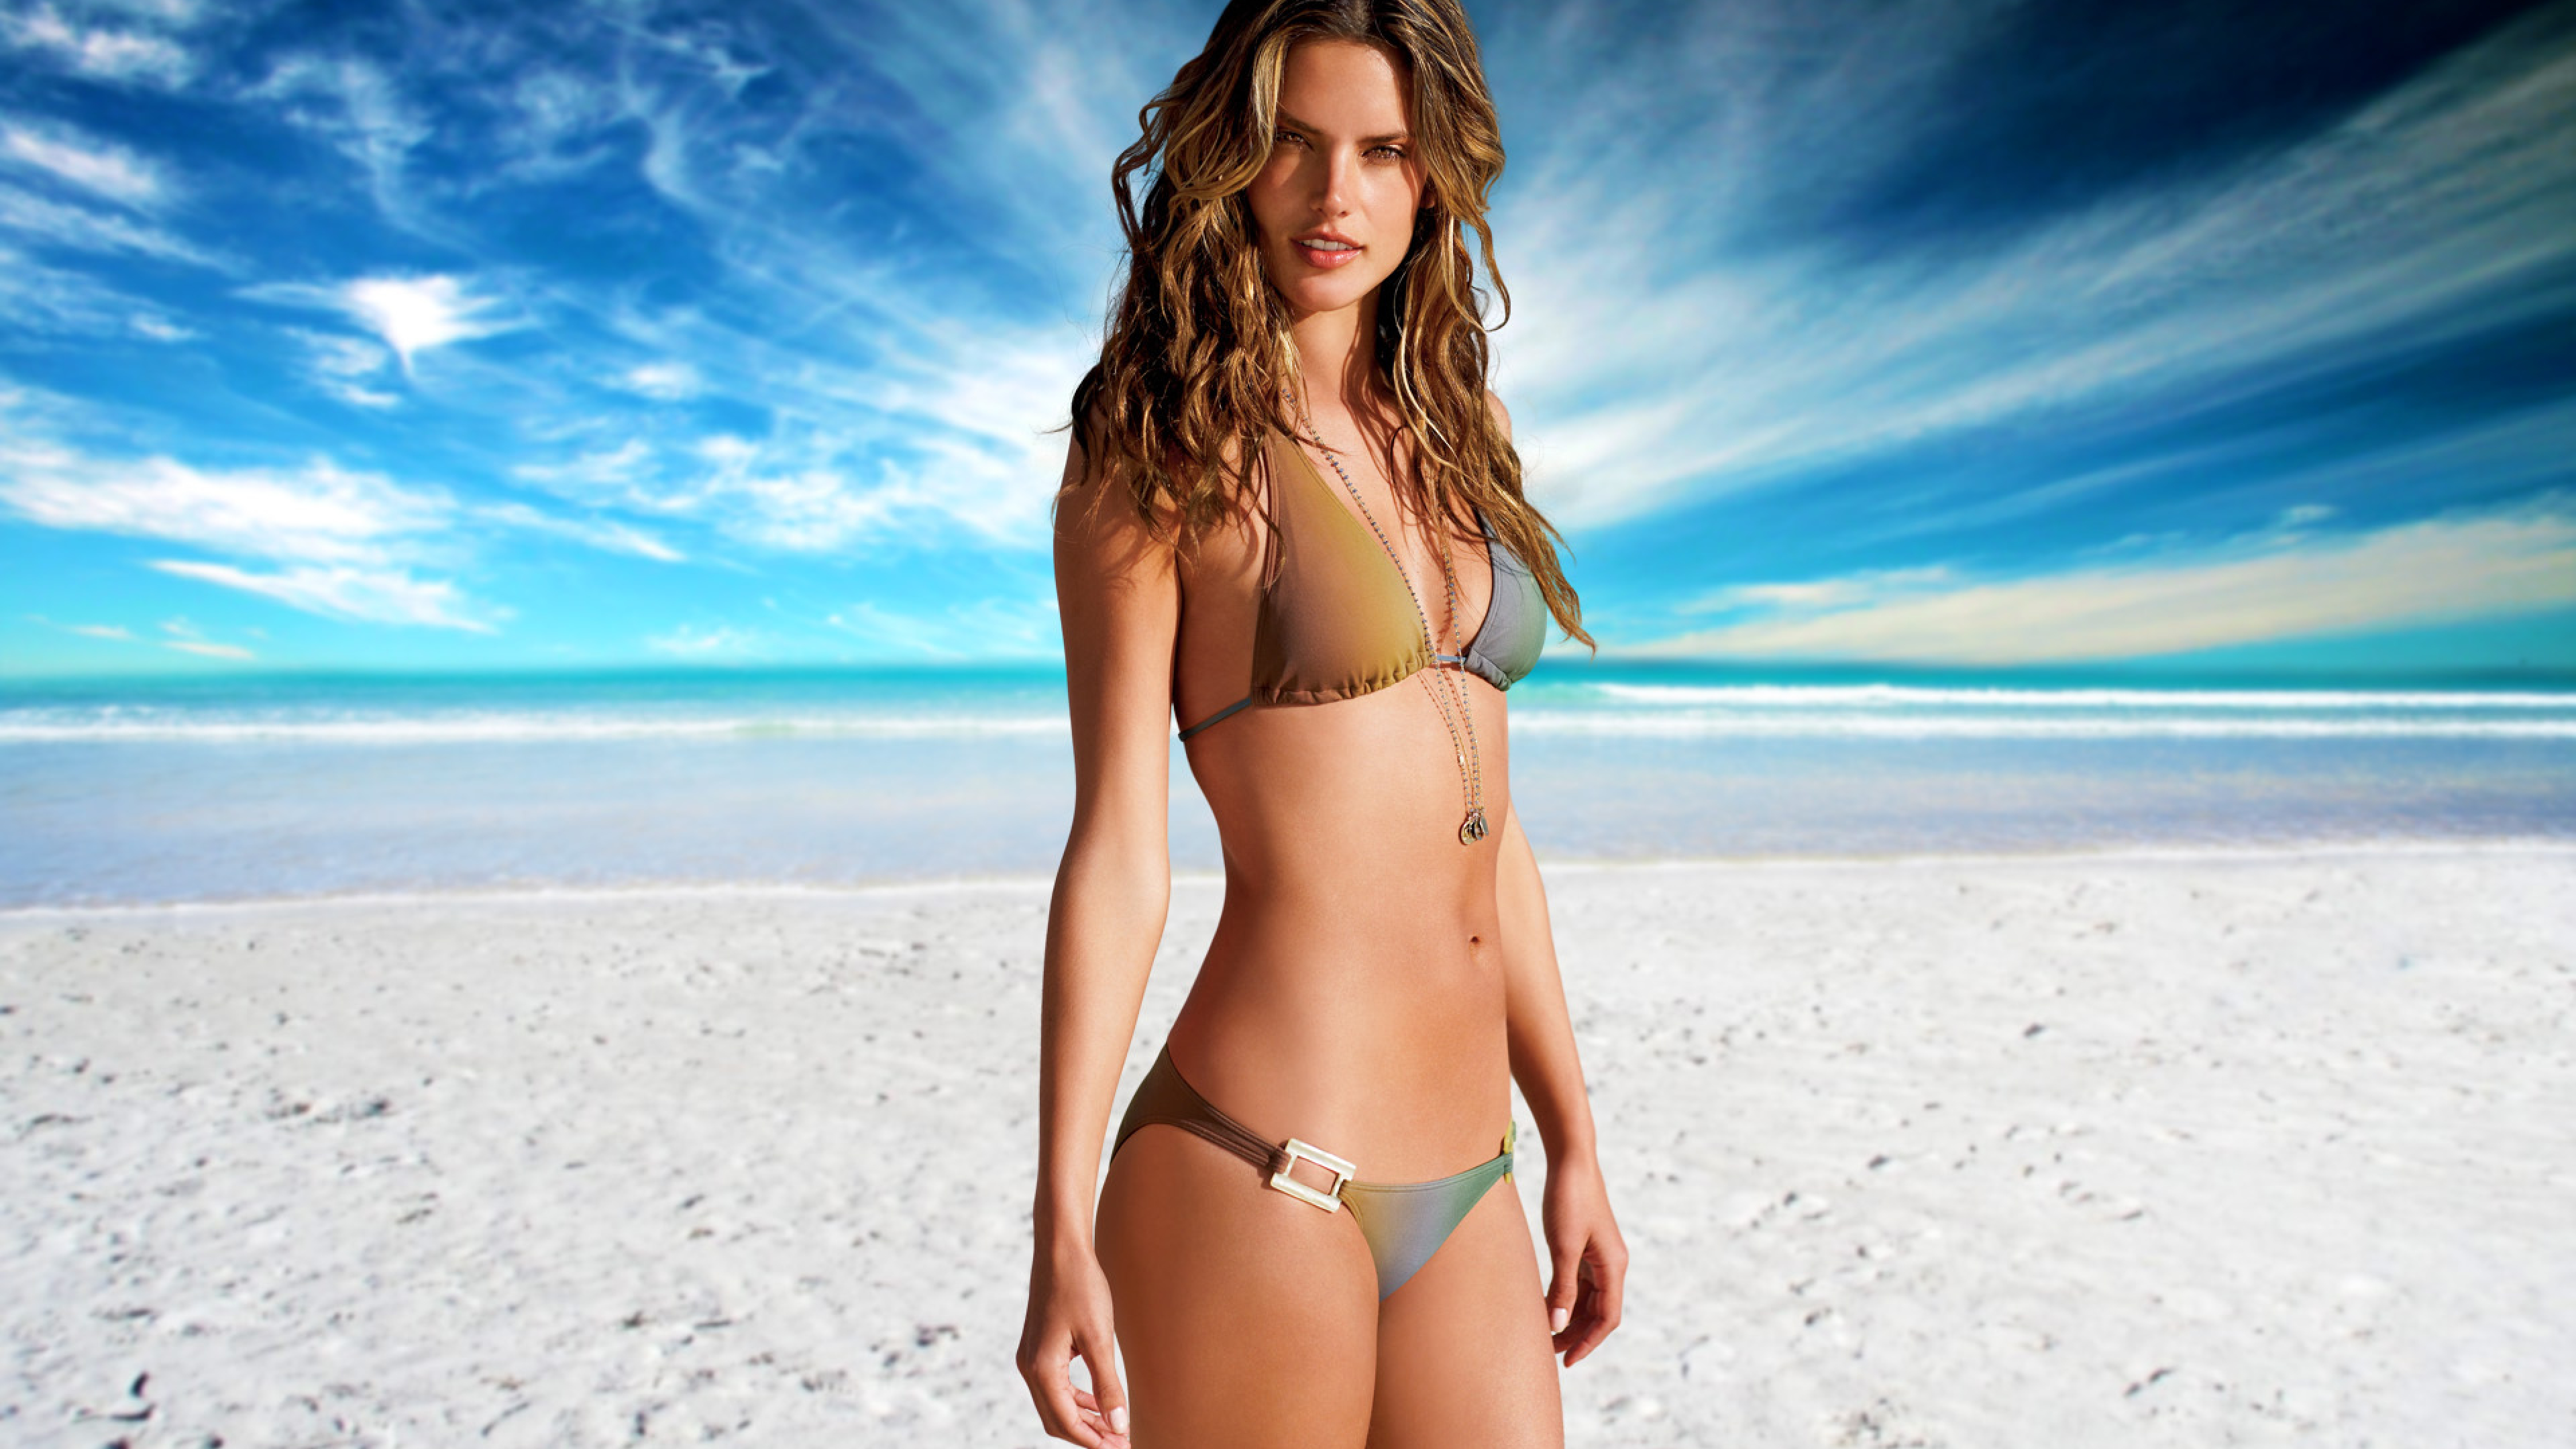 Alessandra ambrosio fit body bikini photoshoot full hd - Hd bikini wallpaper download ...